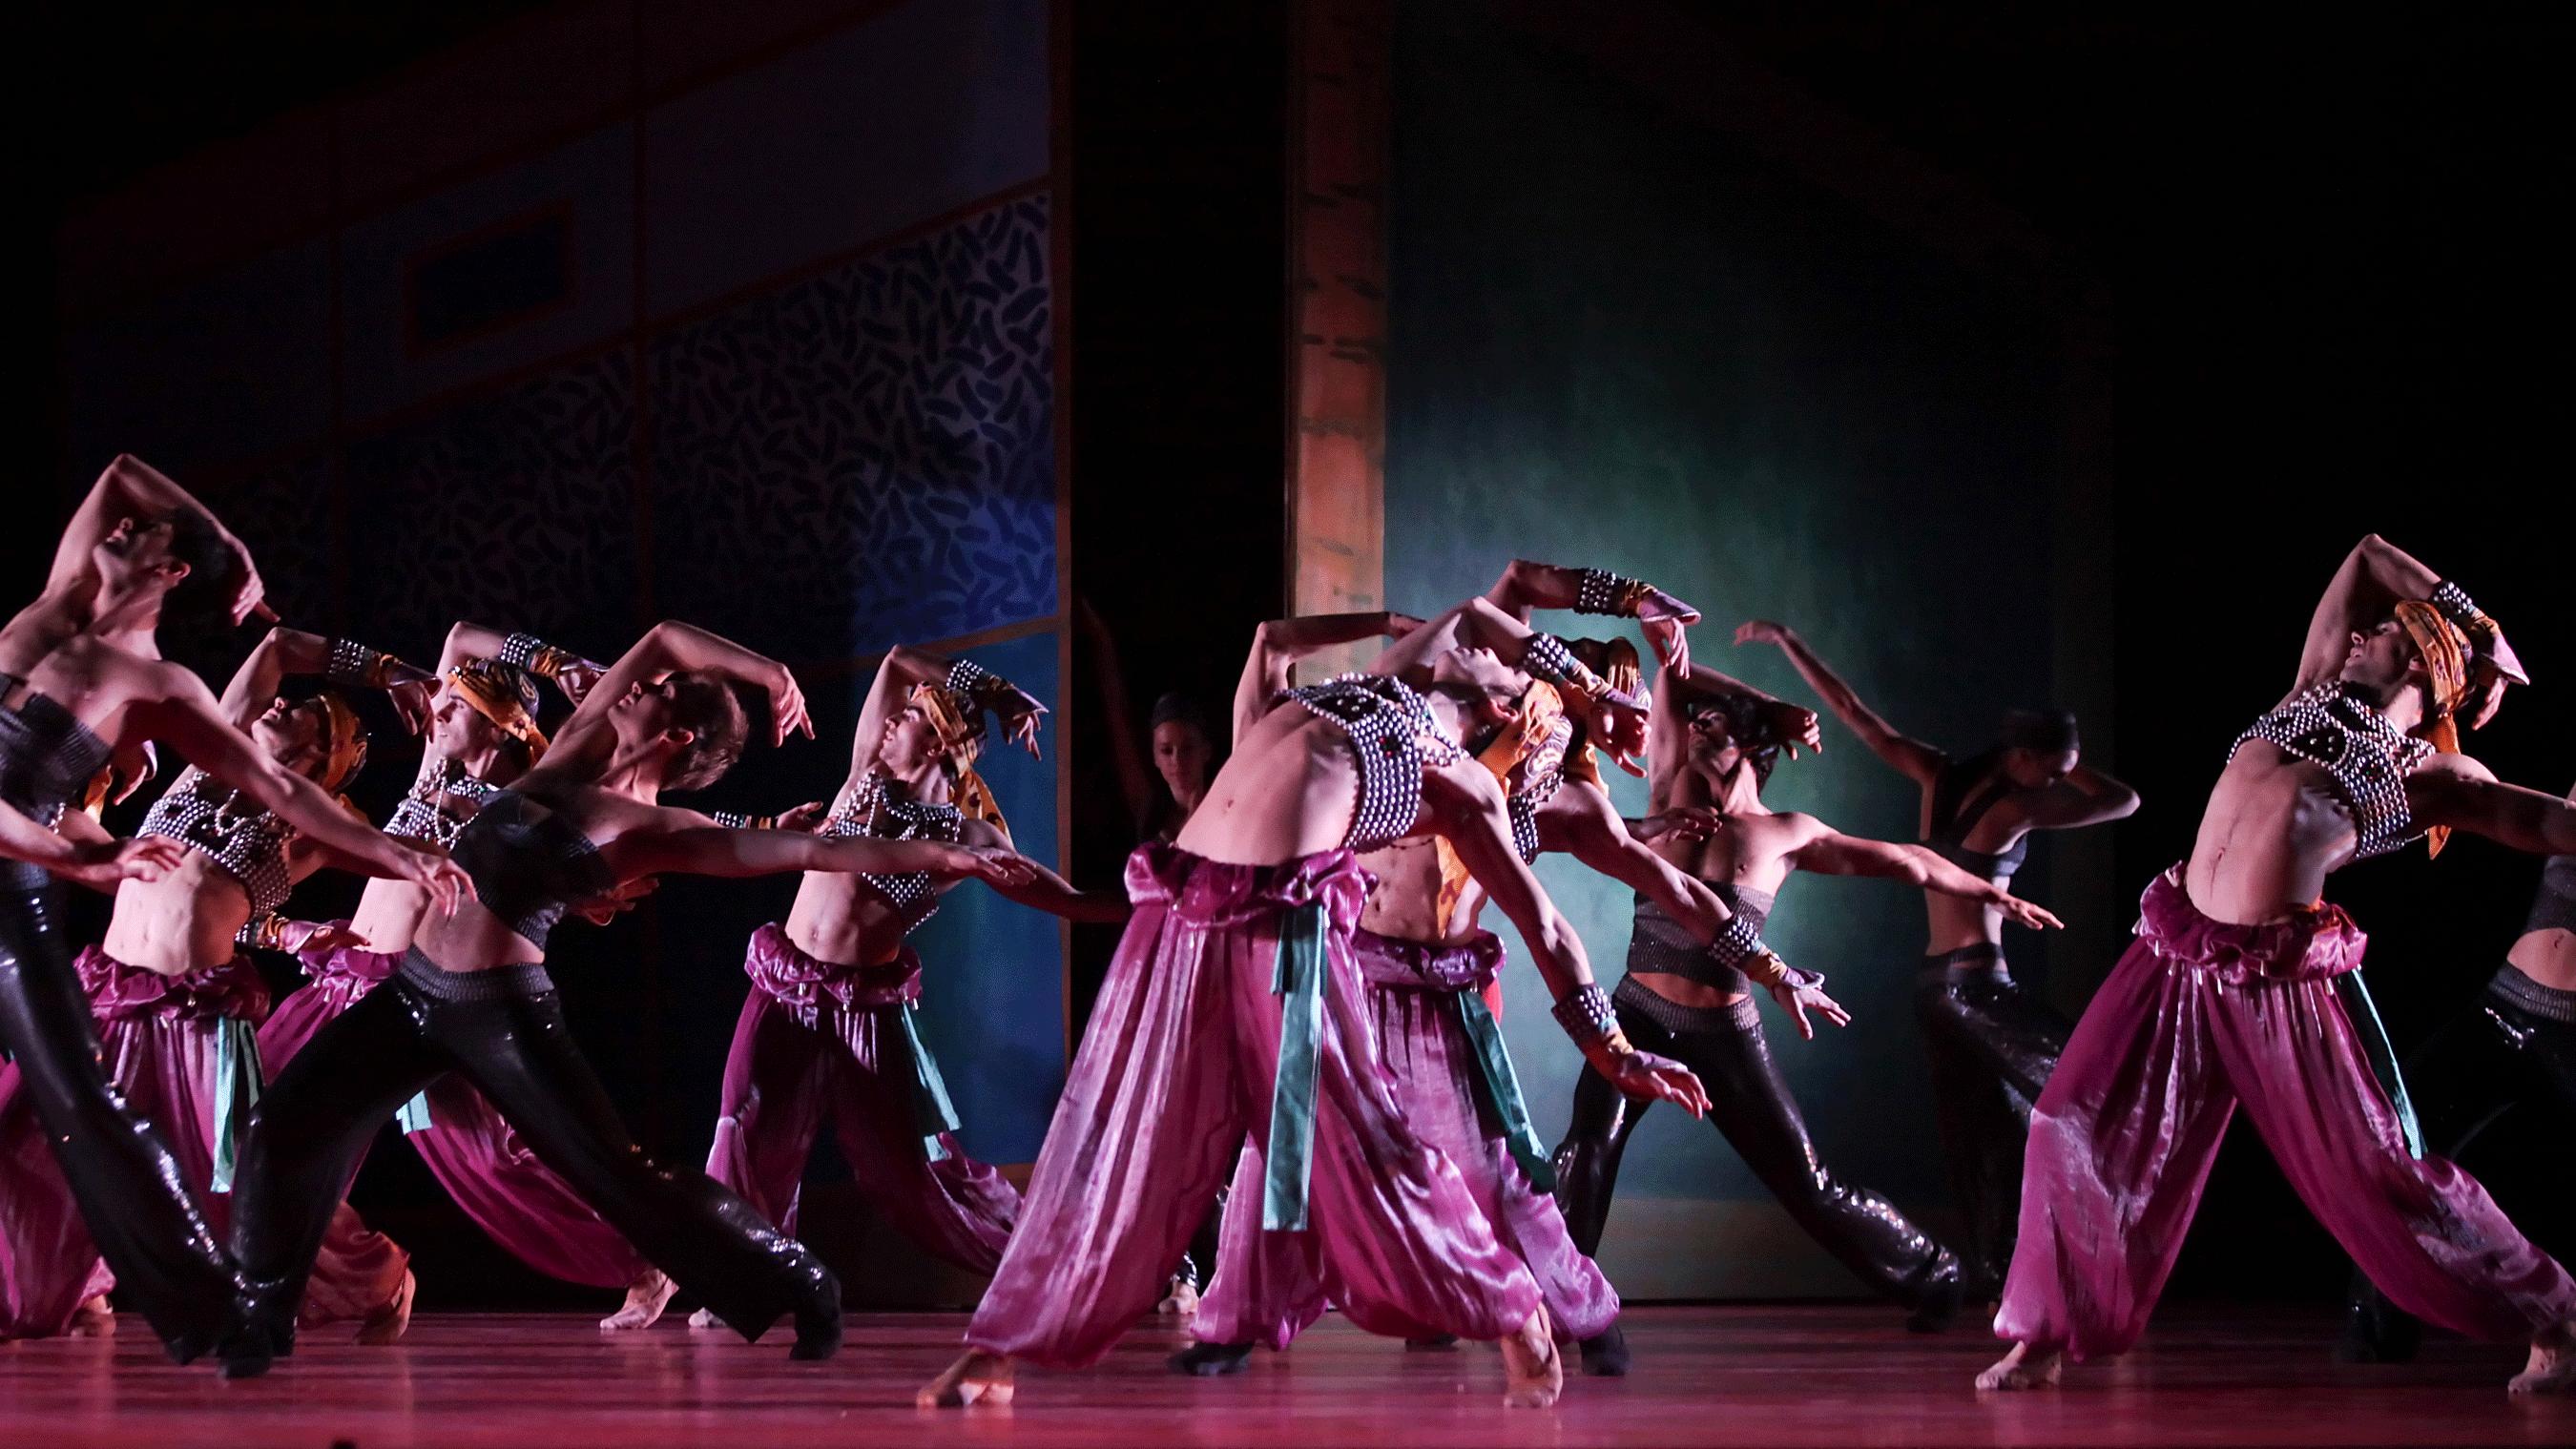 Shéhérazade de Jean-Christophe Maillot, musique de Rimski-Korsakov